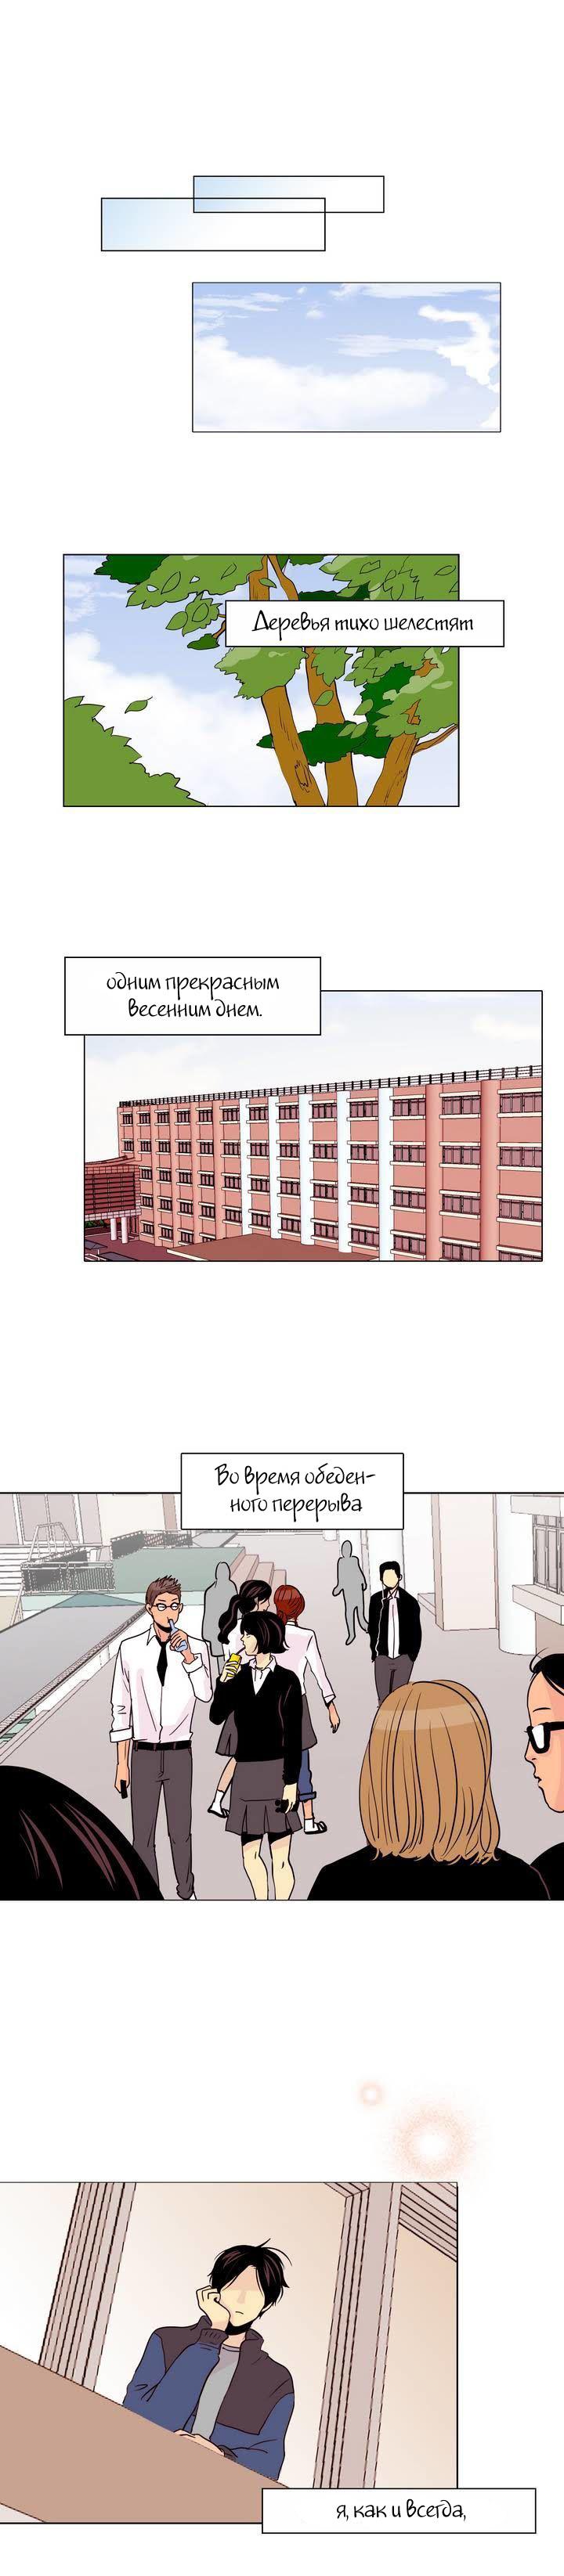 https://r1.ninemanga.com/comics/pic2/33/32161/319814/1488787516697.jpg Page 1